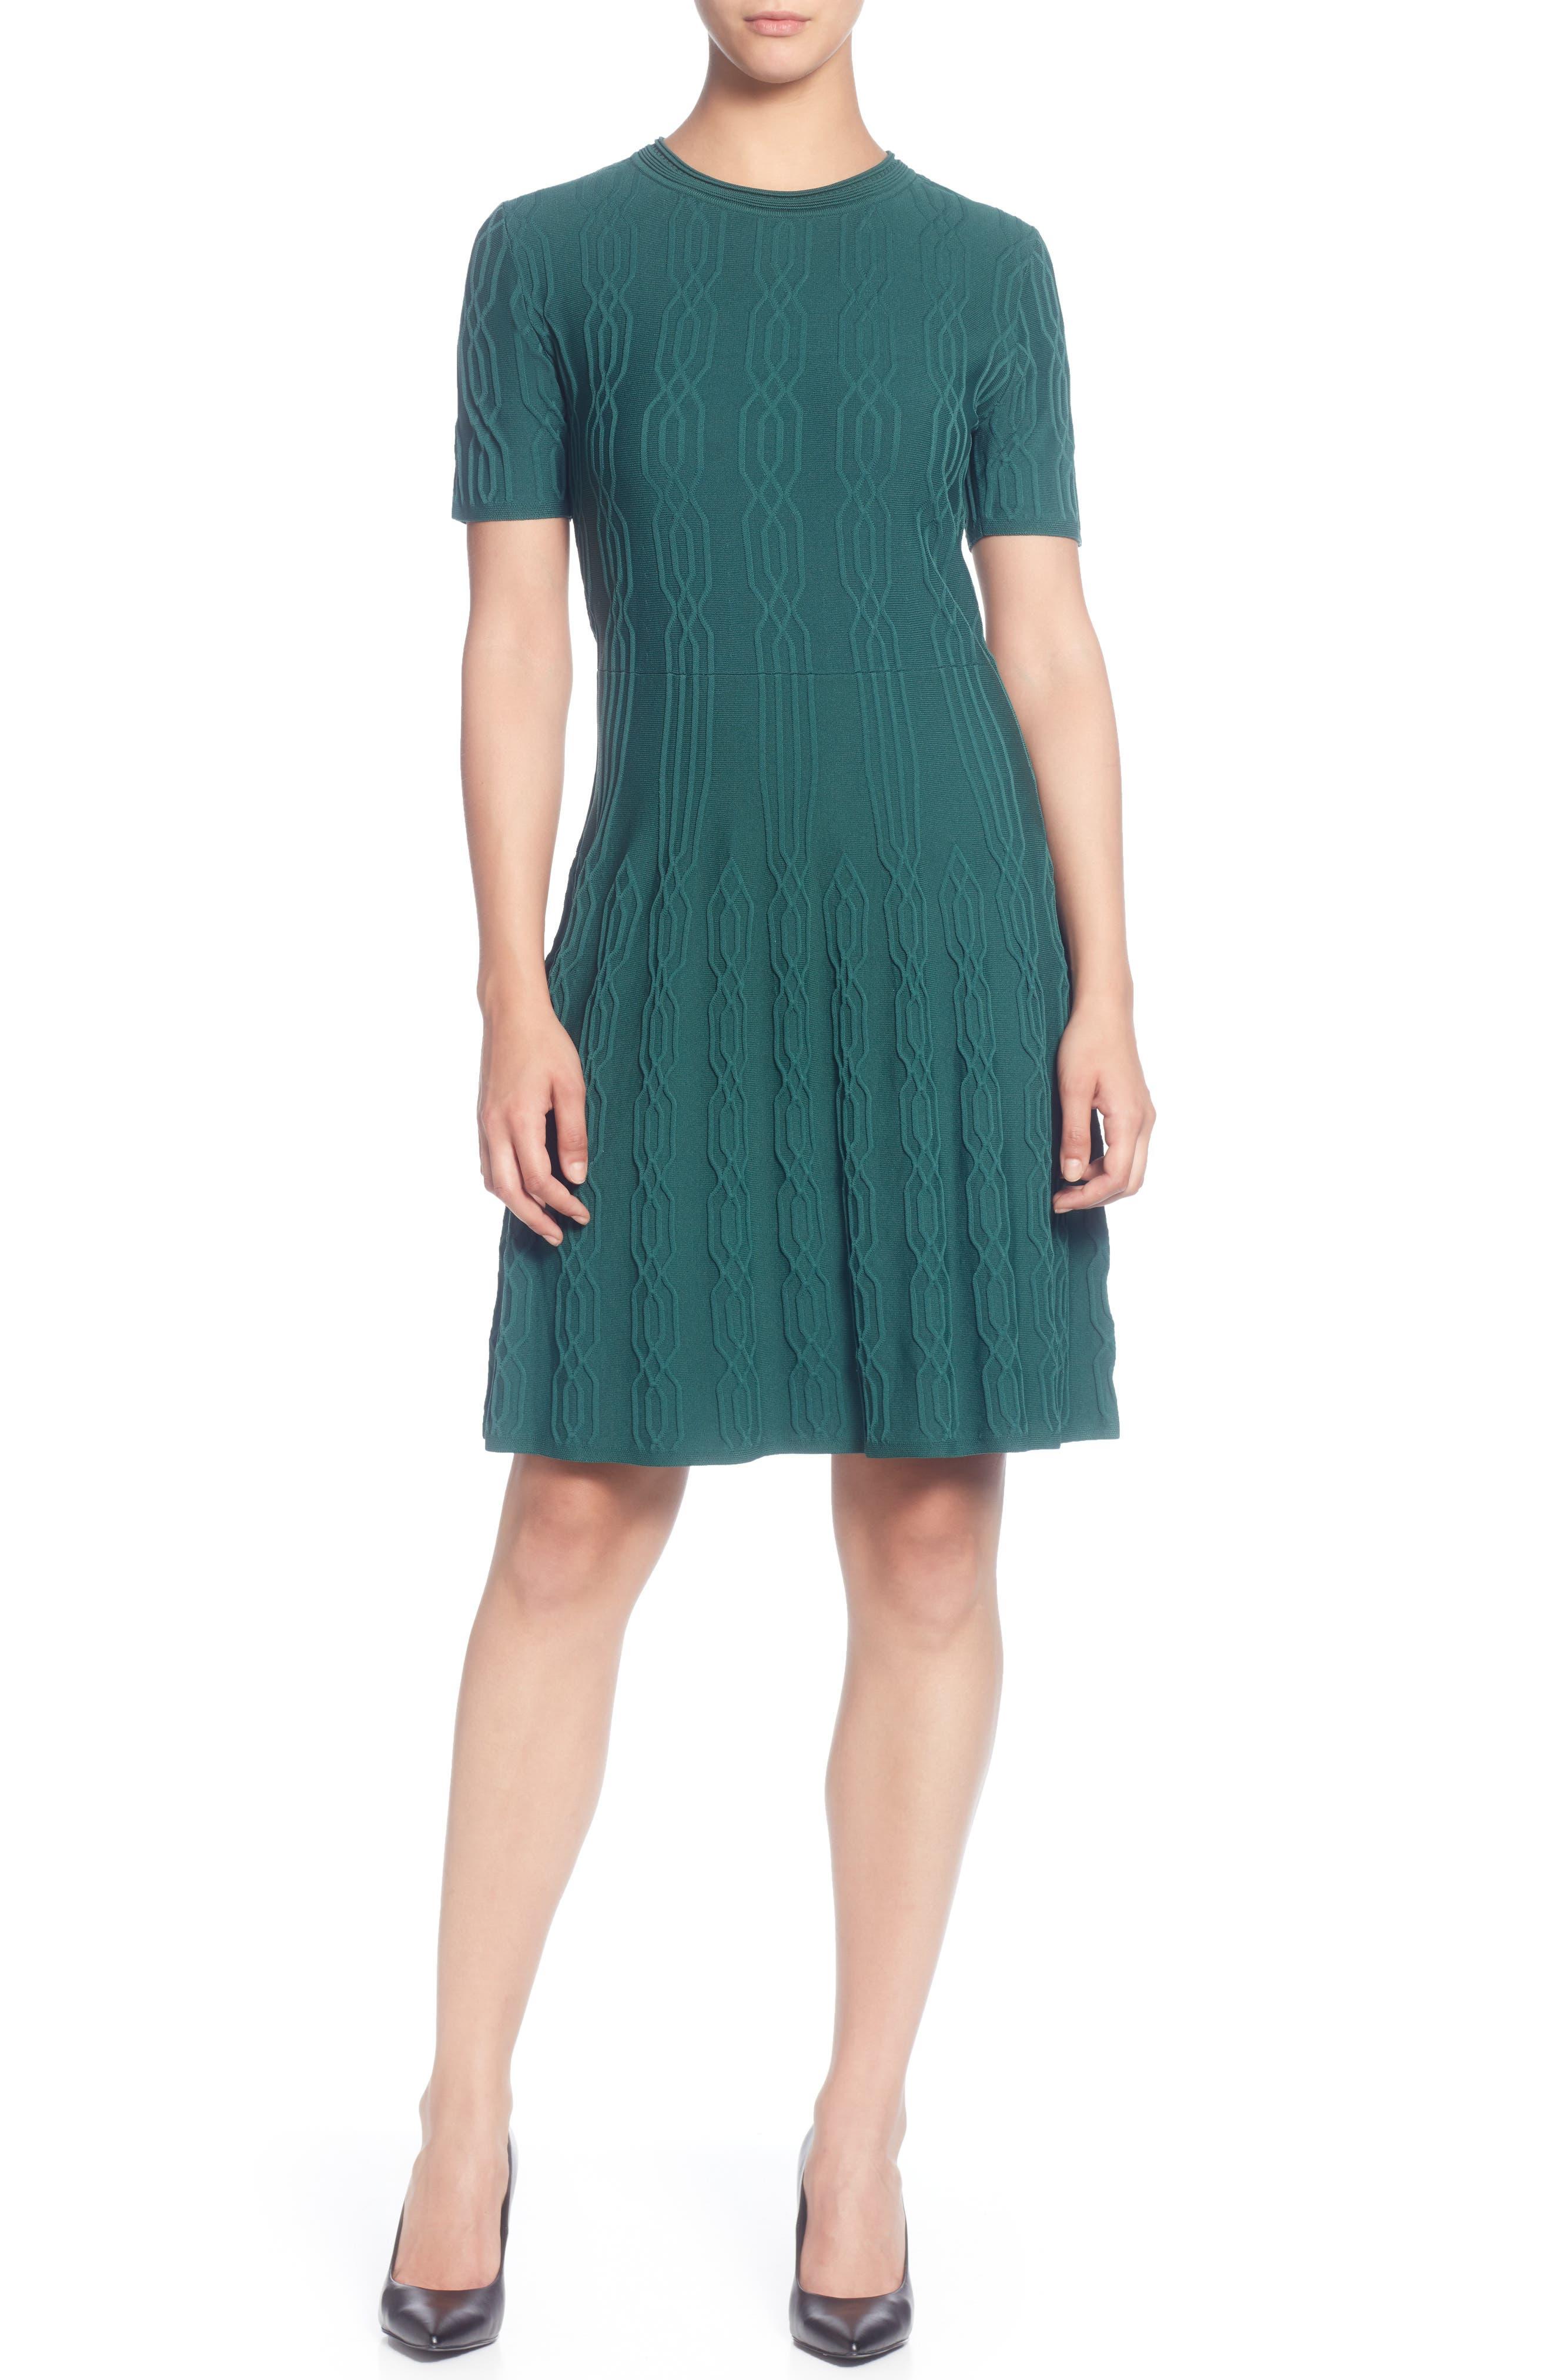 CATHERINE CATHERINE MALANDRINO,                             Jacquard Sweater Dress,                             Main thumbnail 1, color,                             JUNE BUG